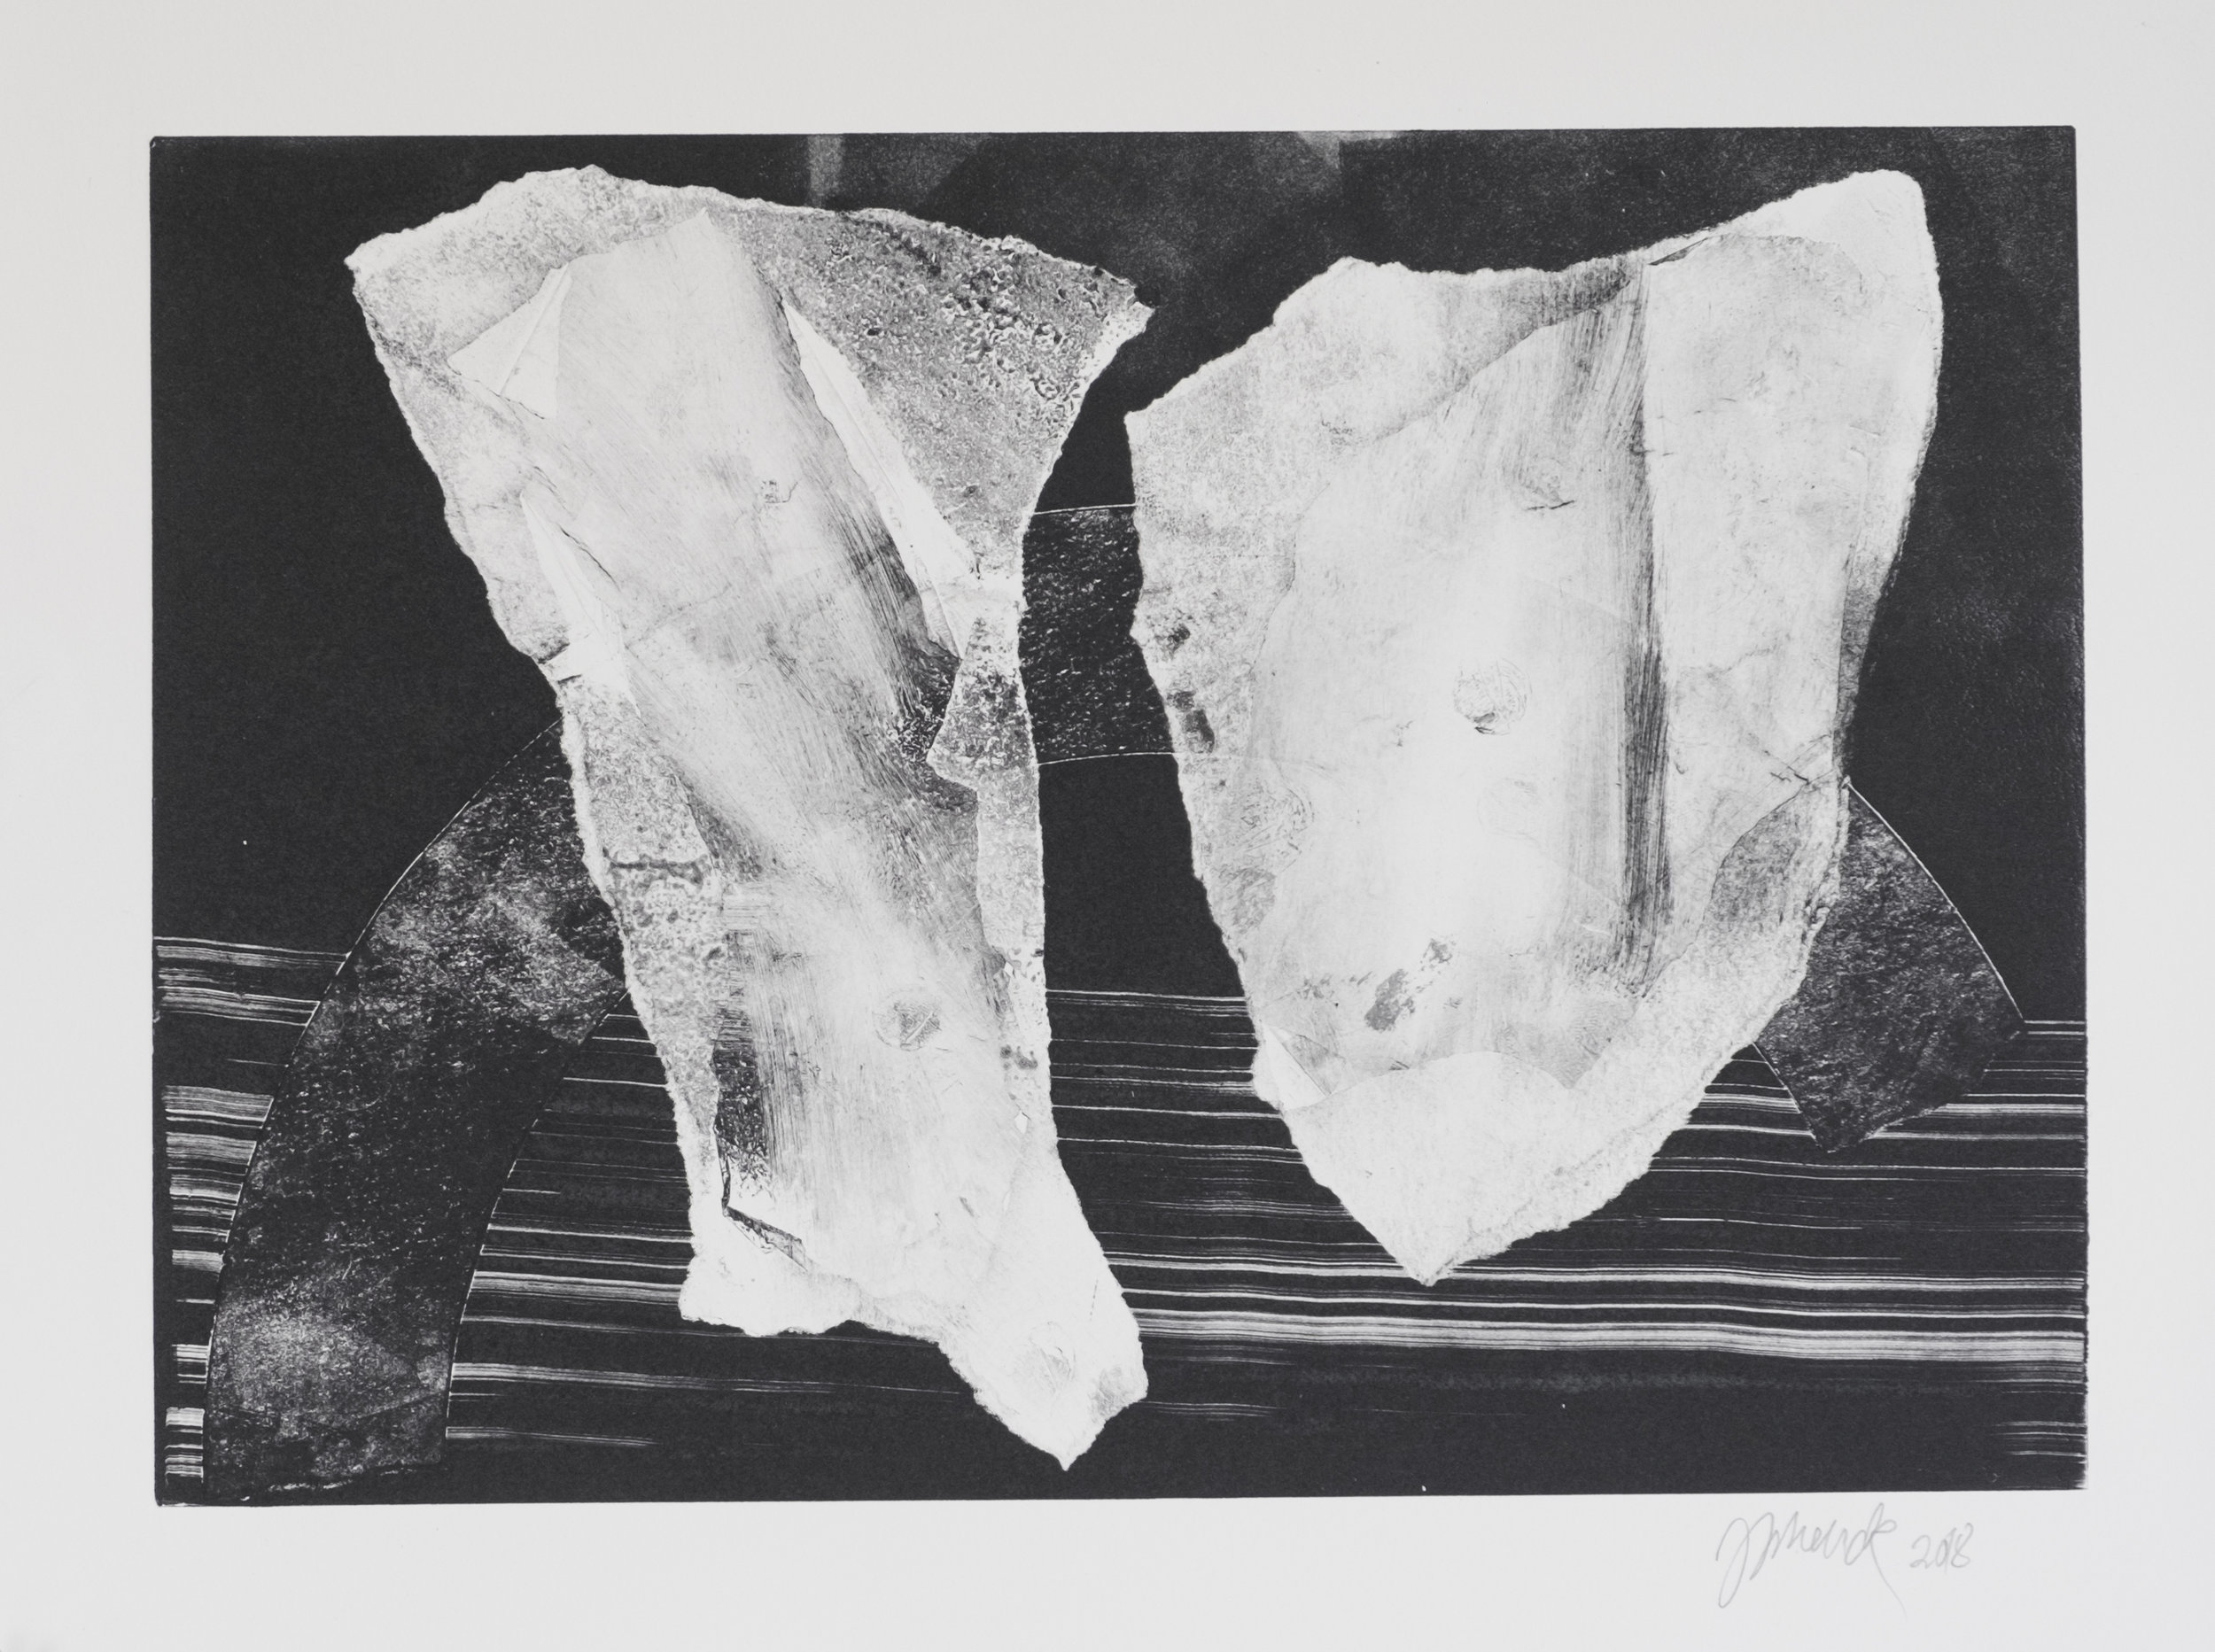 Forms on black 3 (34 cm x 24 cm)